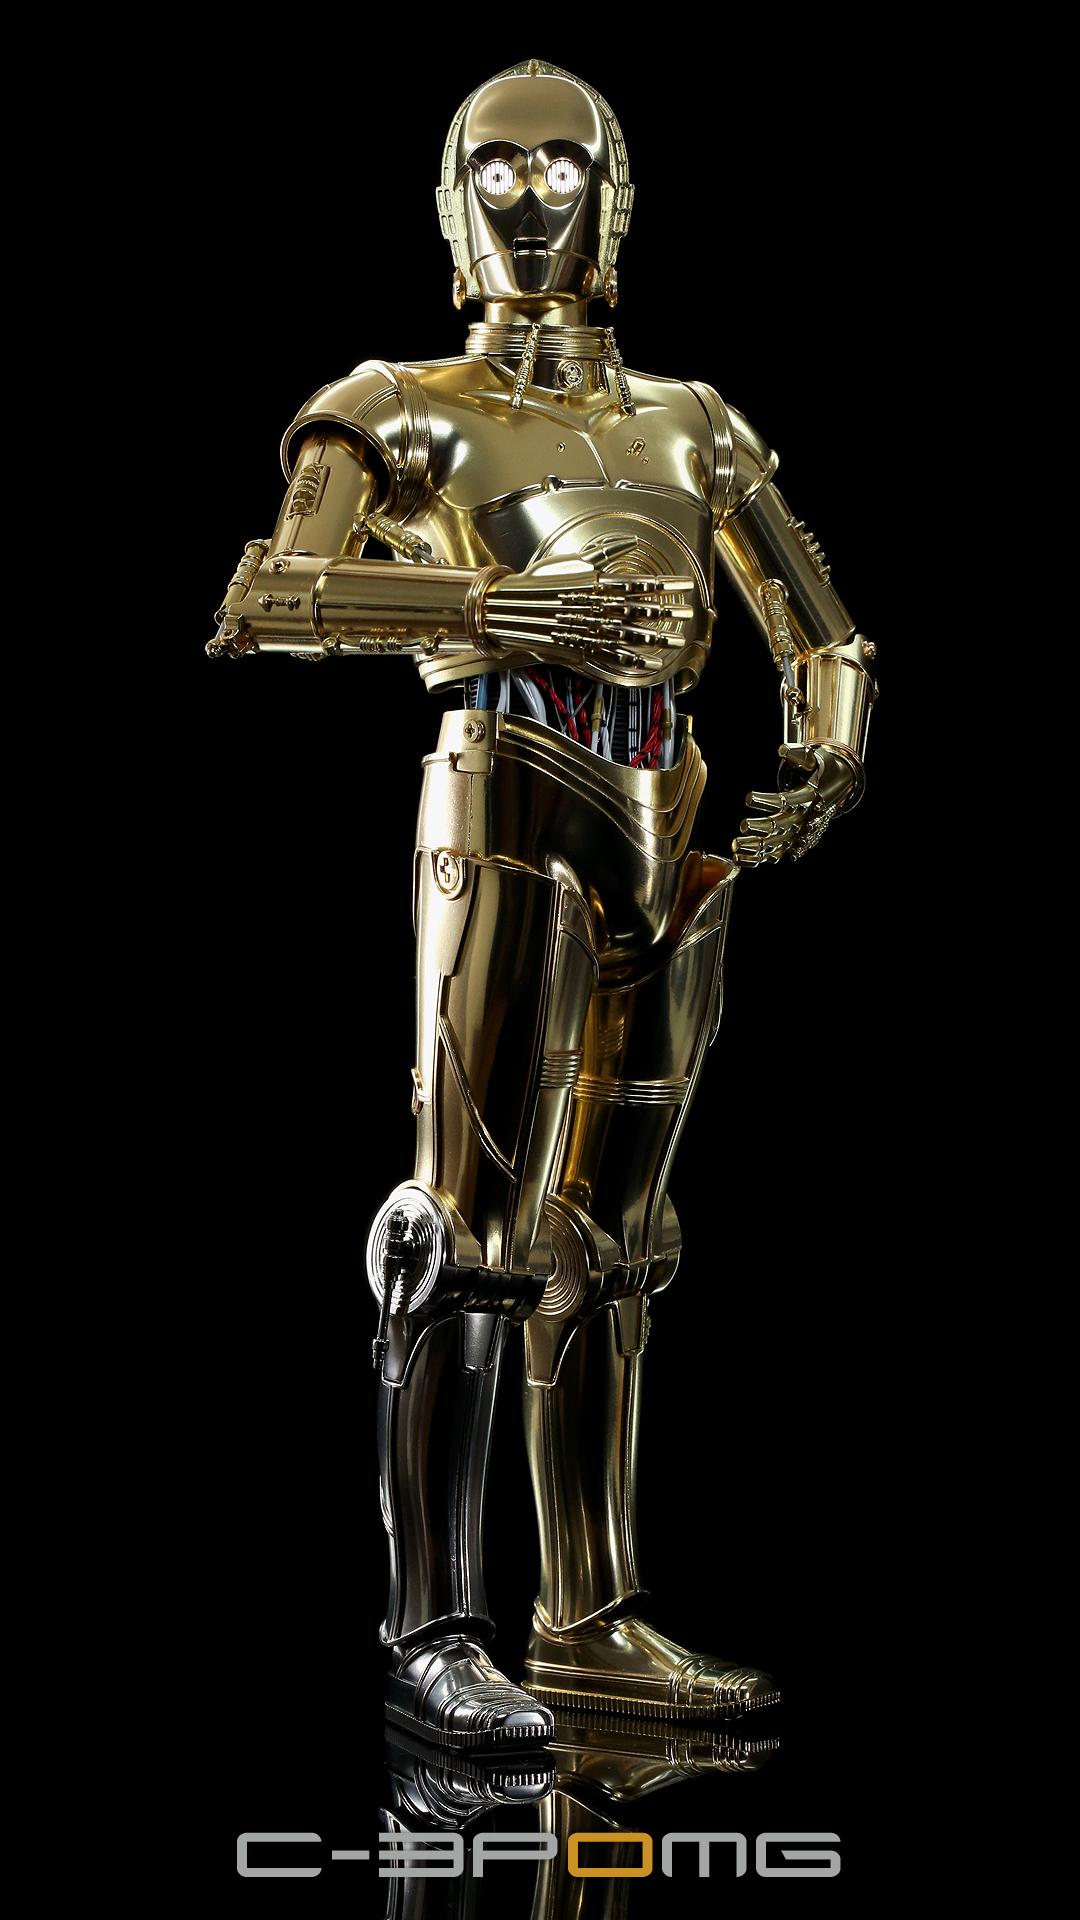 [Bandai] Star Wars: C-3PO - Perfect Model 1/6 scale - LANÇADO!!! - Página 2 C-3PO1016_zpsb49f5f8e